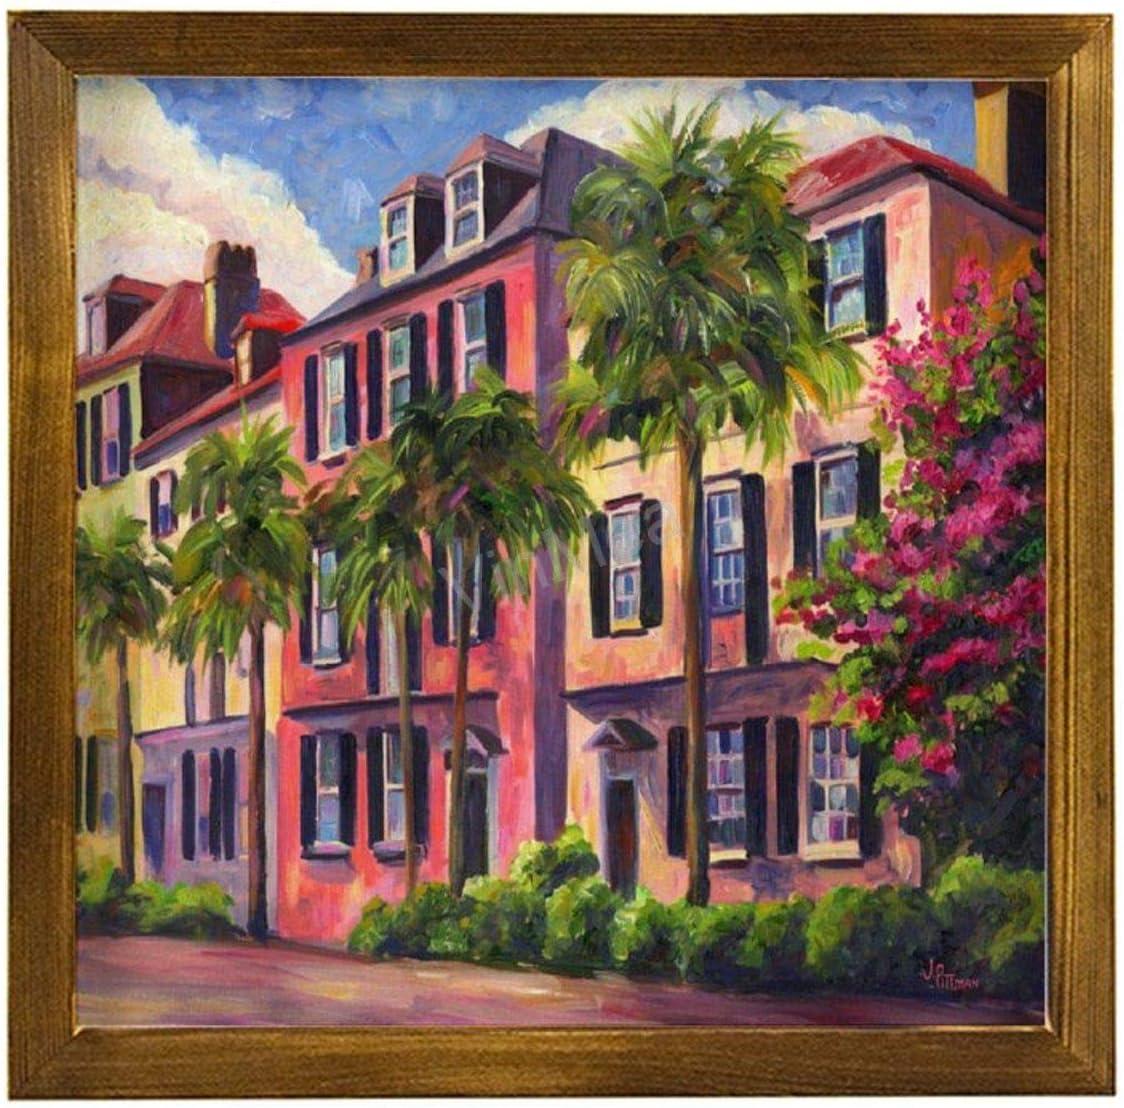 "VinMea Home Decor Wood Sign Rainbow-Row-Charleston-Sc-Jeff-Pittman Framed Wood Sign,Rustic Wall Art Sign Wall Hanging Home Decor Wall Art 12""X12"""